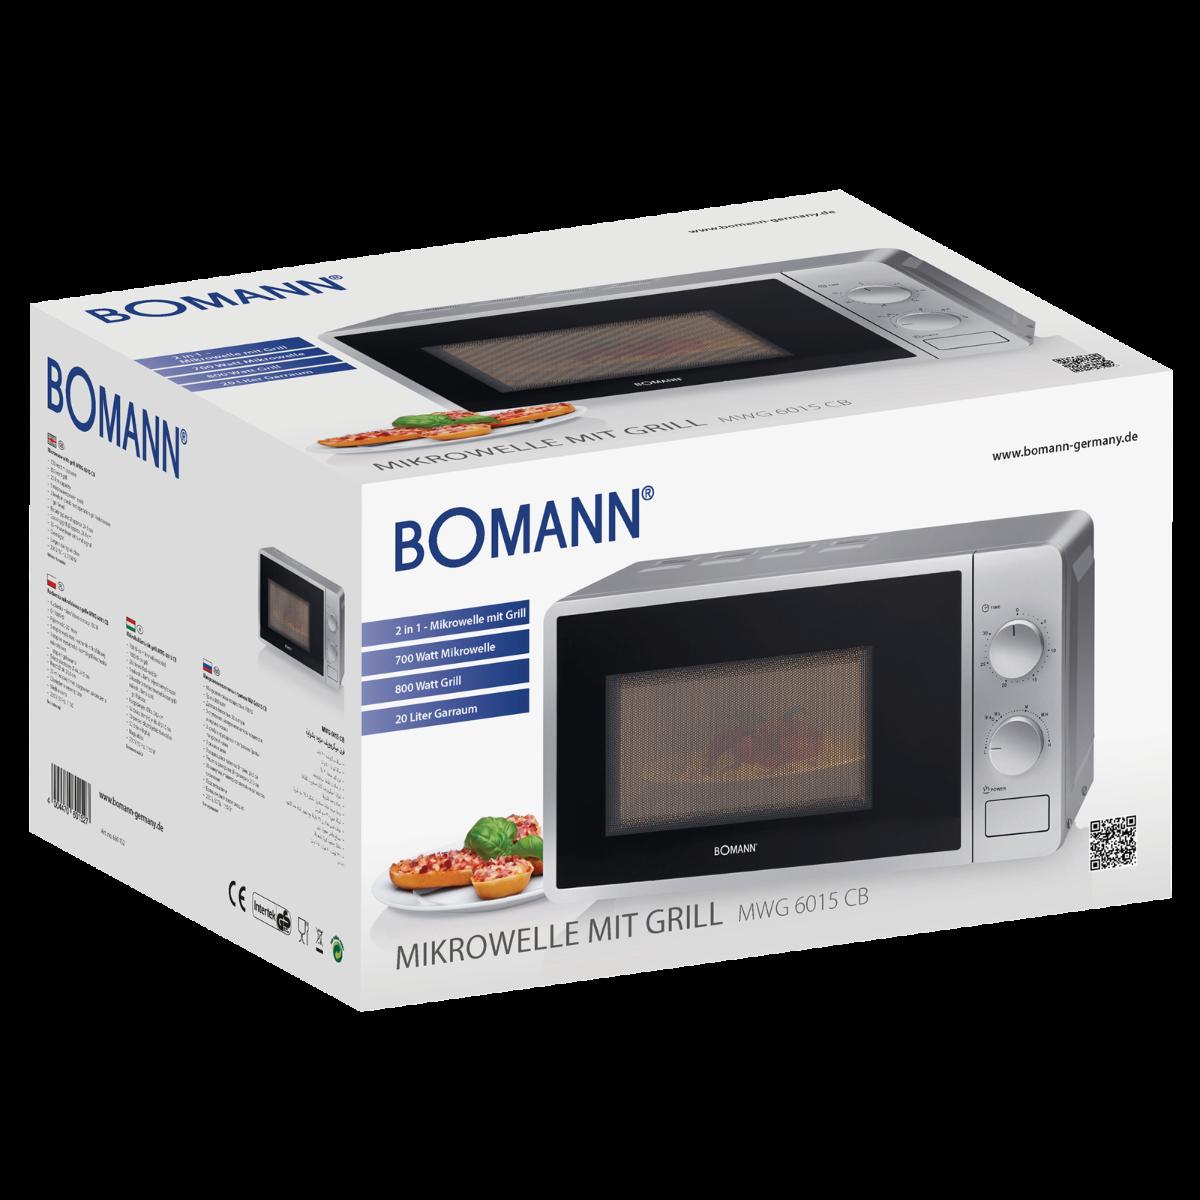 Bomann MWG 6015 CB Mikrowelle Freistehend Silber Neu